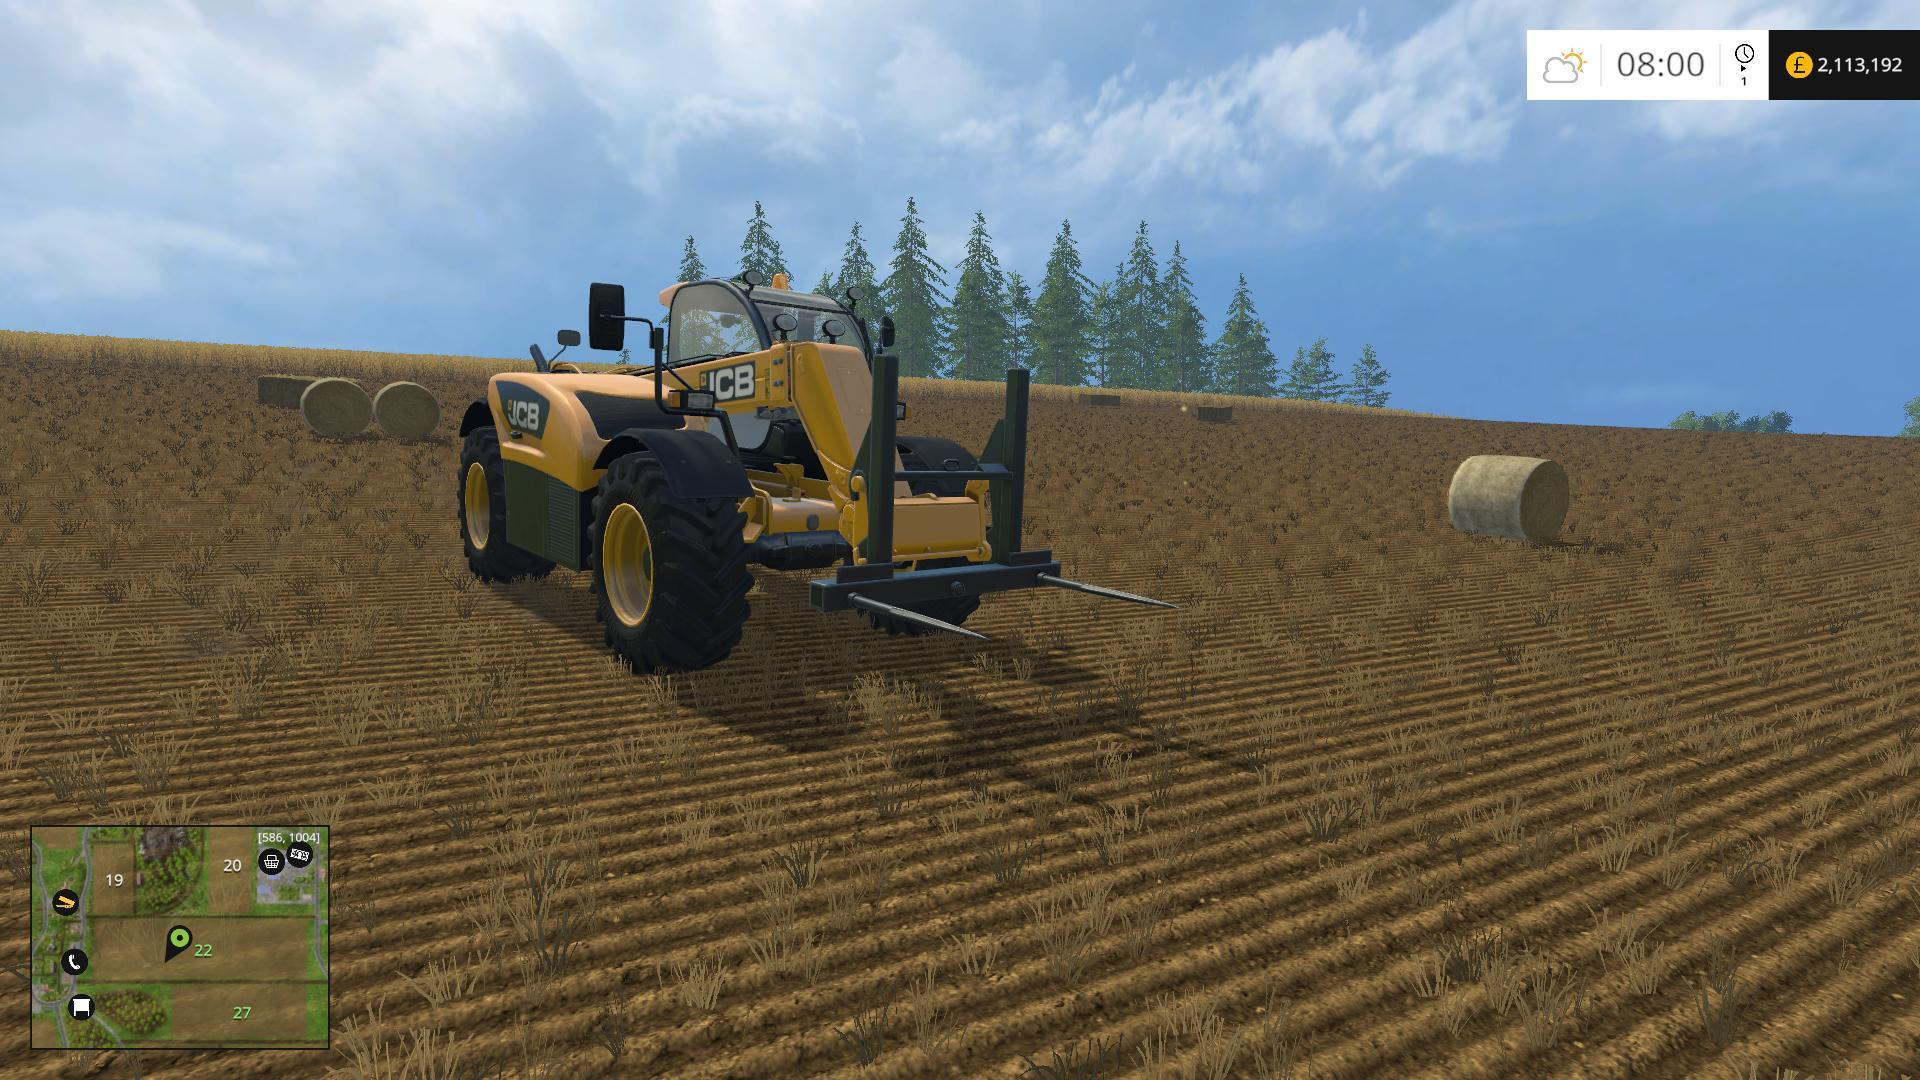 DOUBLE BALE SPIKE • Farming simulator 19, 17, 15 mods | FS19